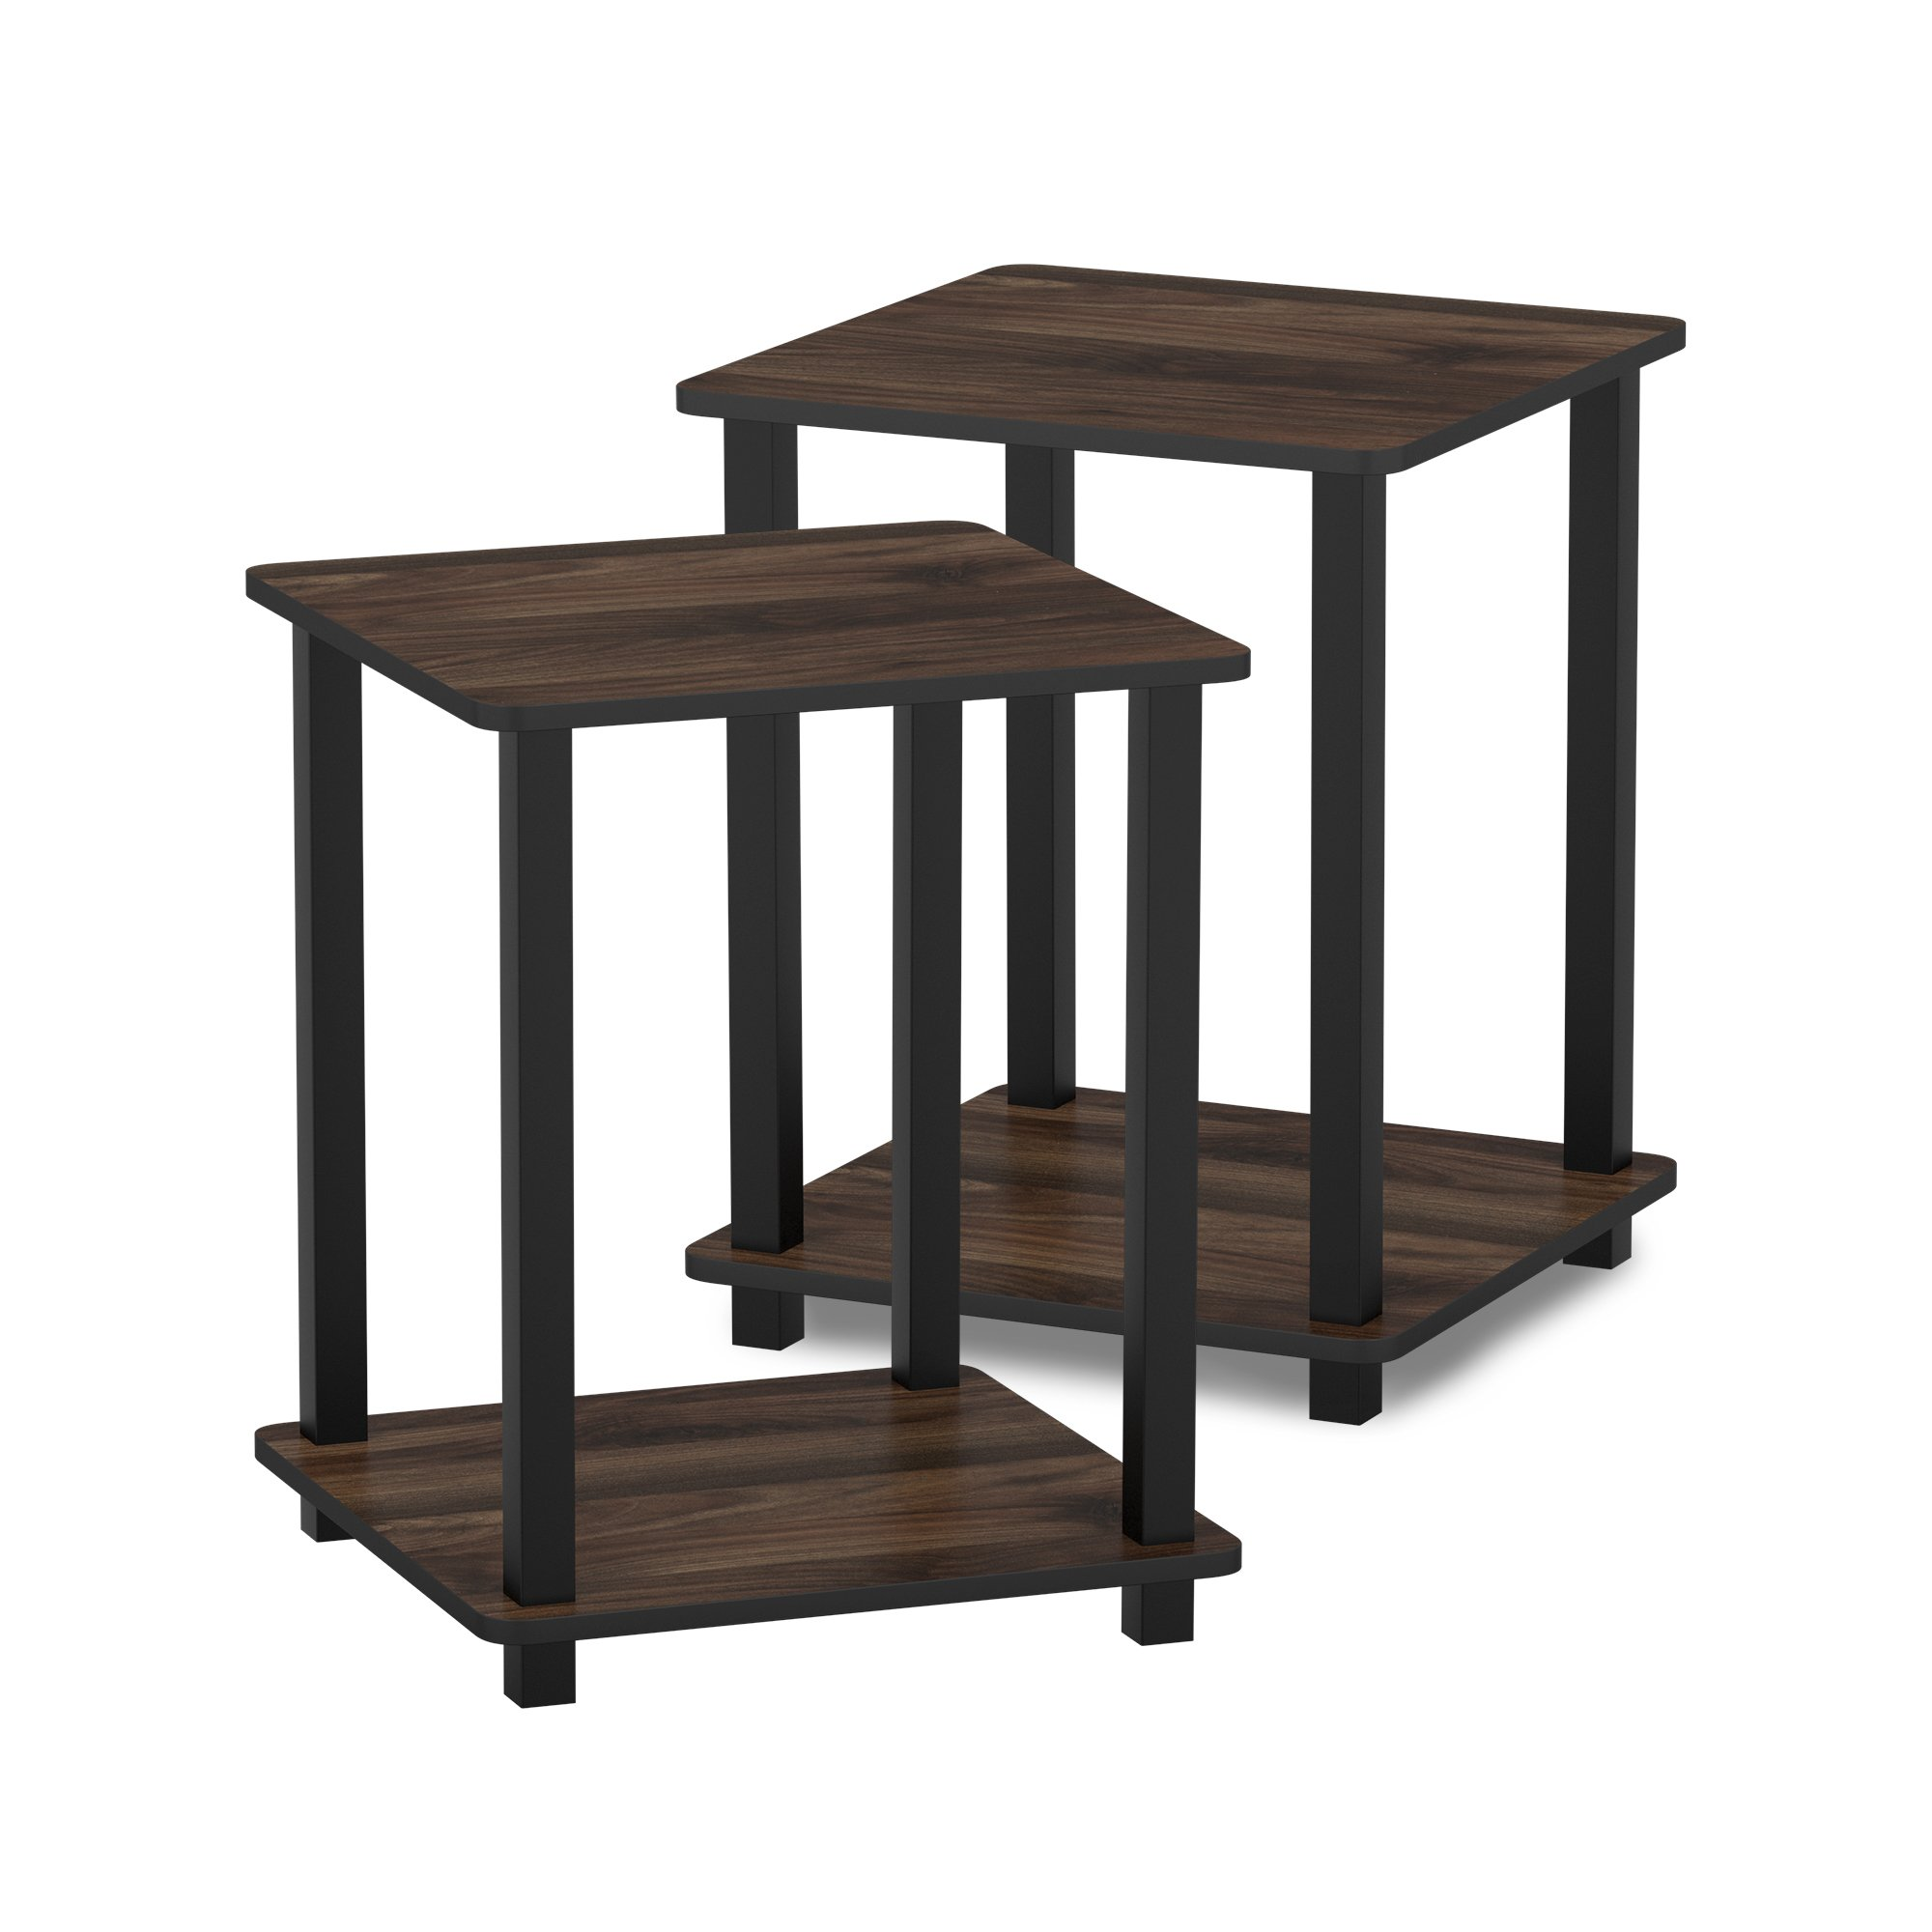 FURINNO Simplistic End Table, Columbia Walnut/Black by Furinno